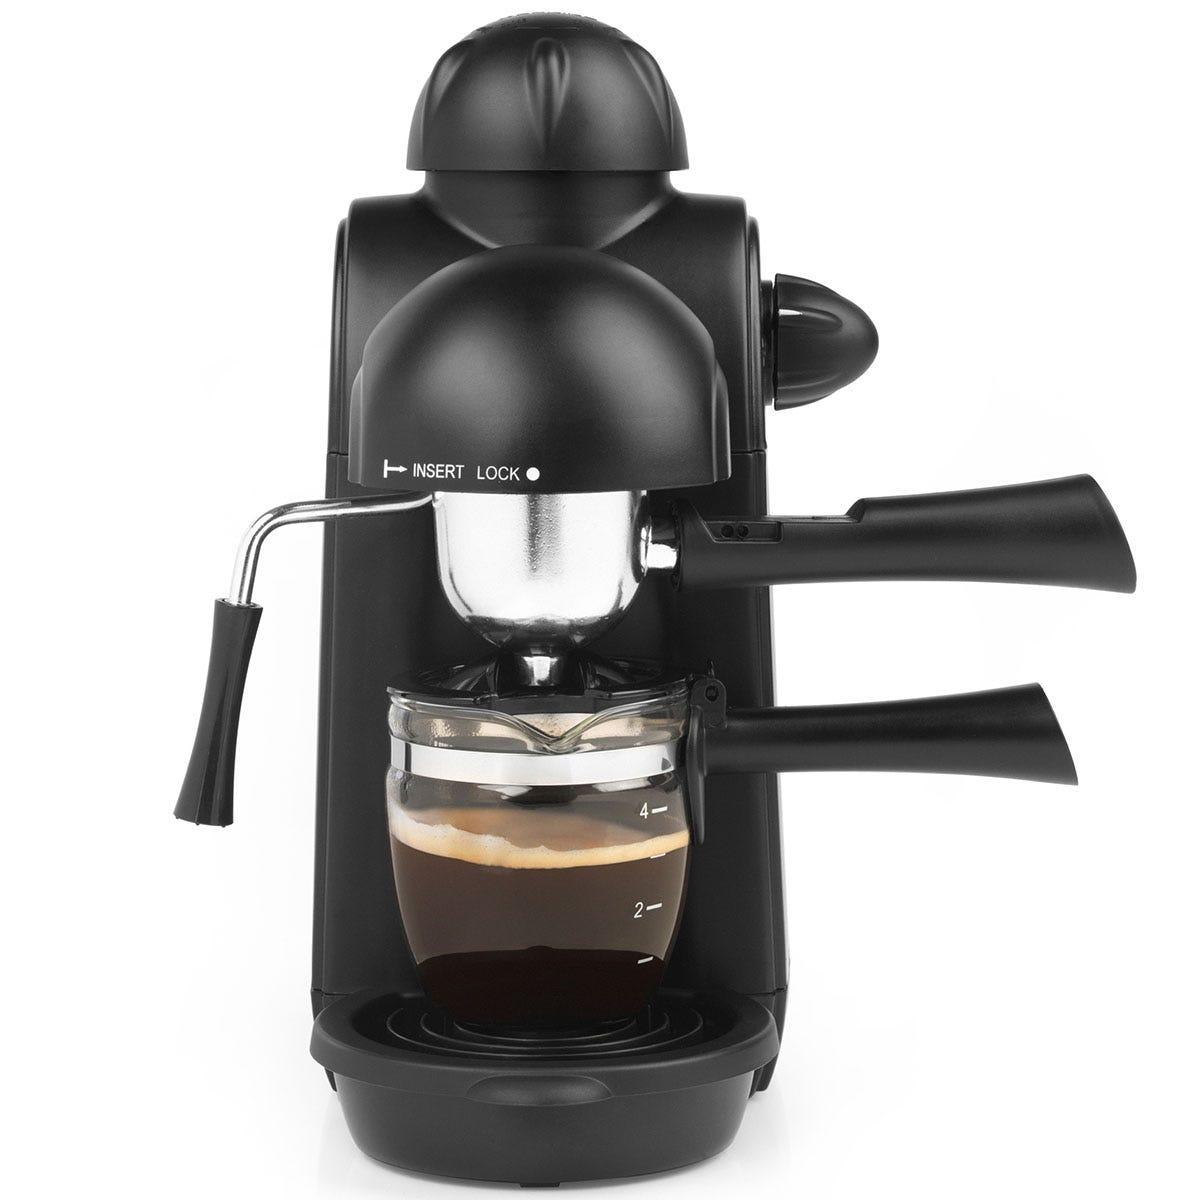 Salter EK3131 Espressimo Barista Style Coffee Machine - Black